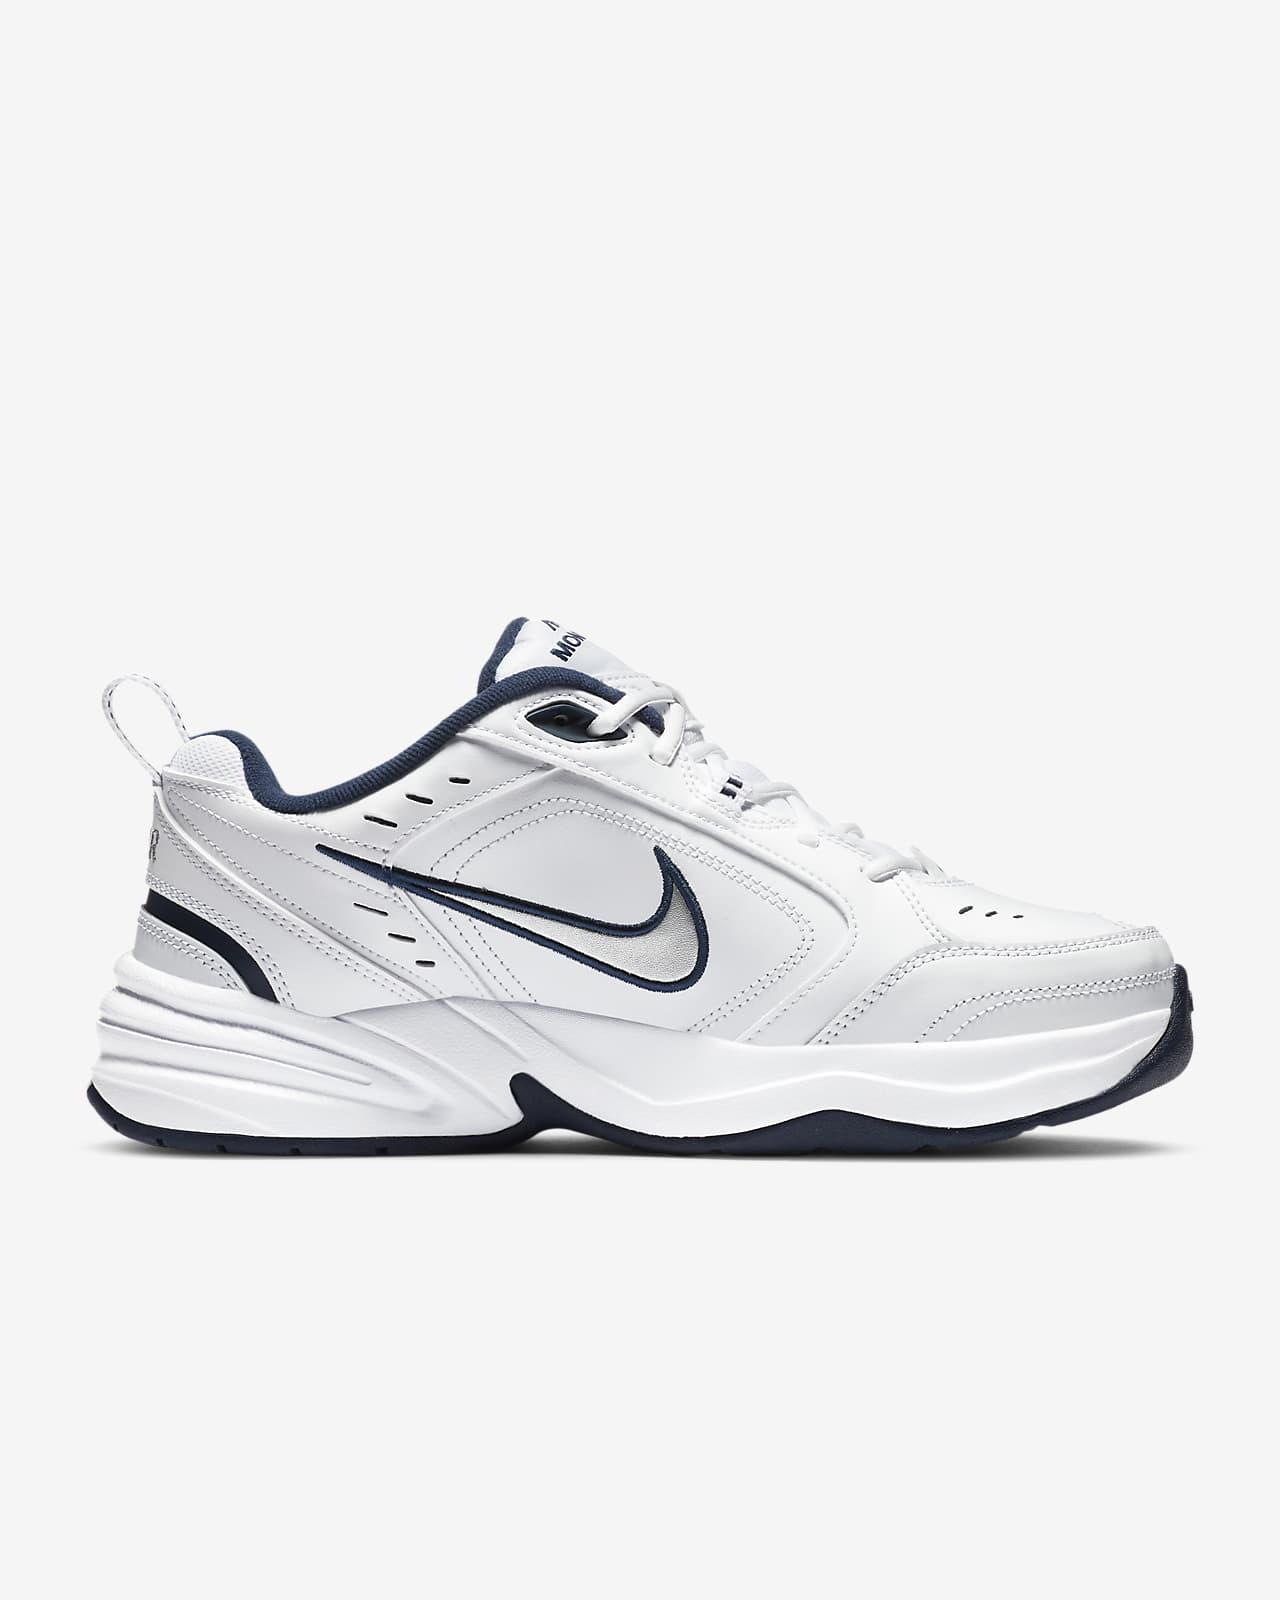 air monarch iv sneakers women's